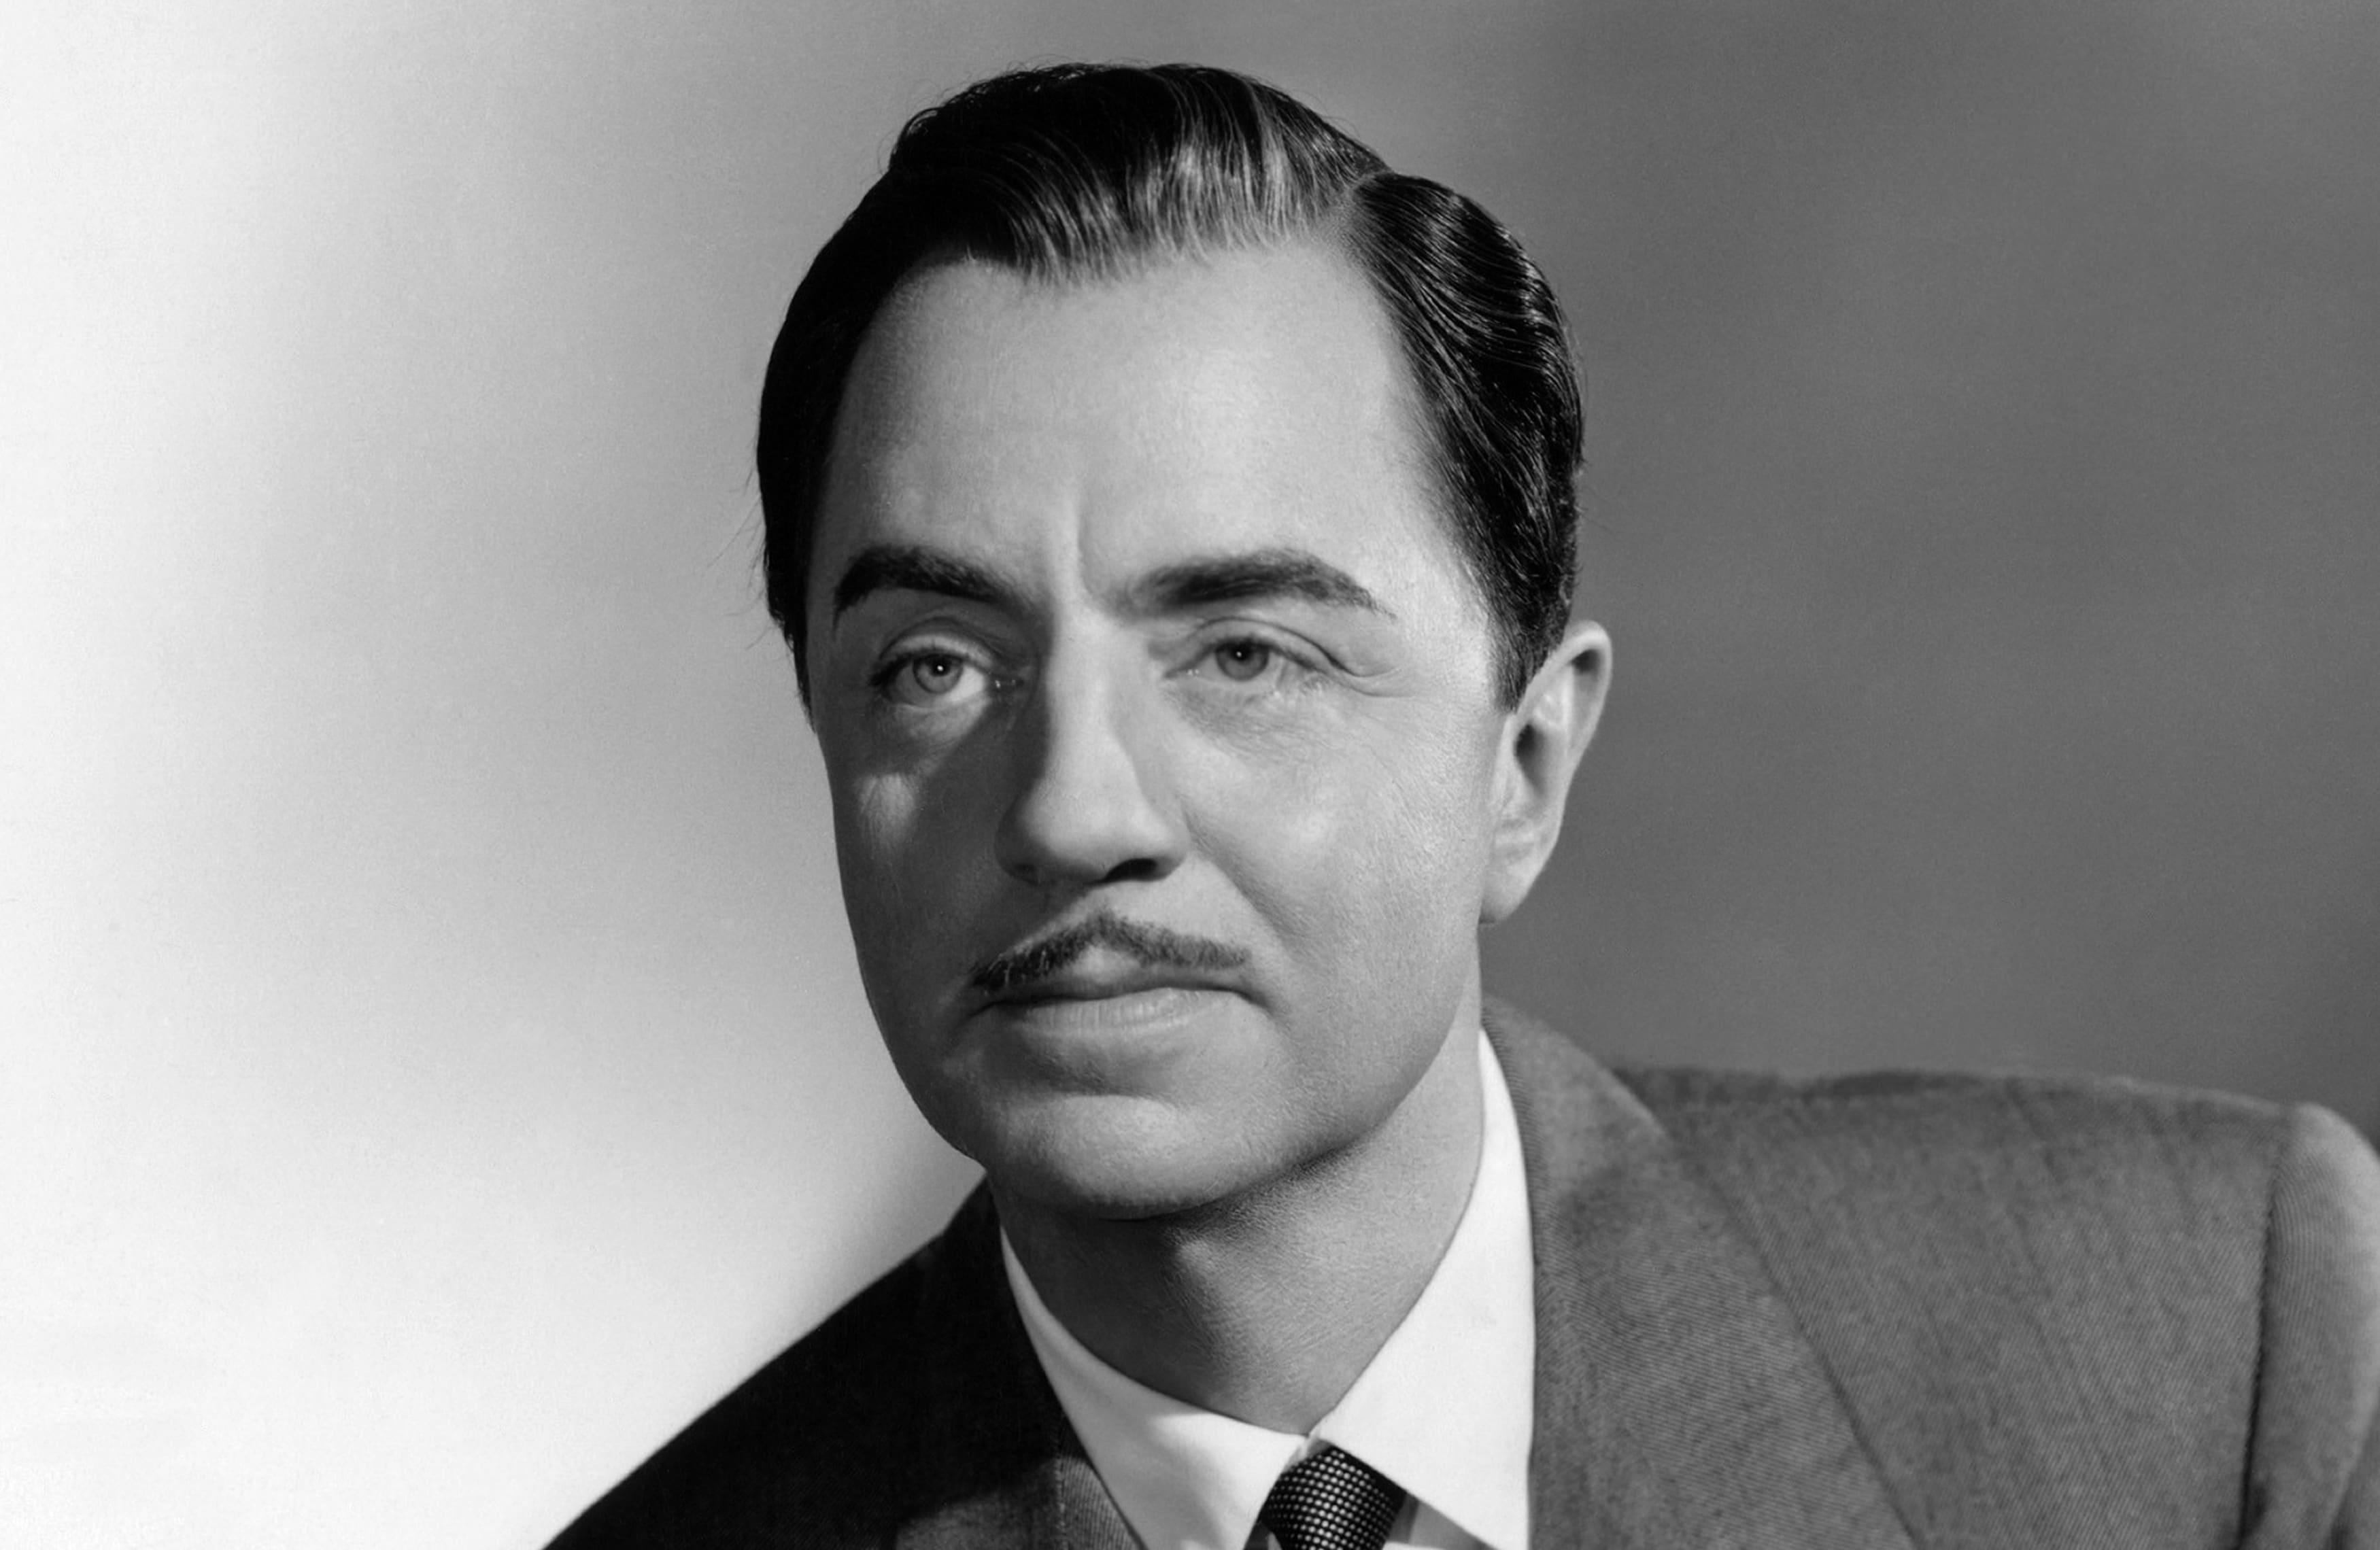 William Powell Turner Classic Movies